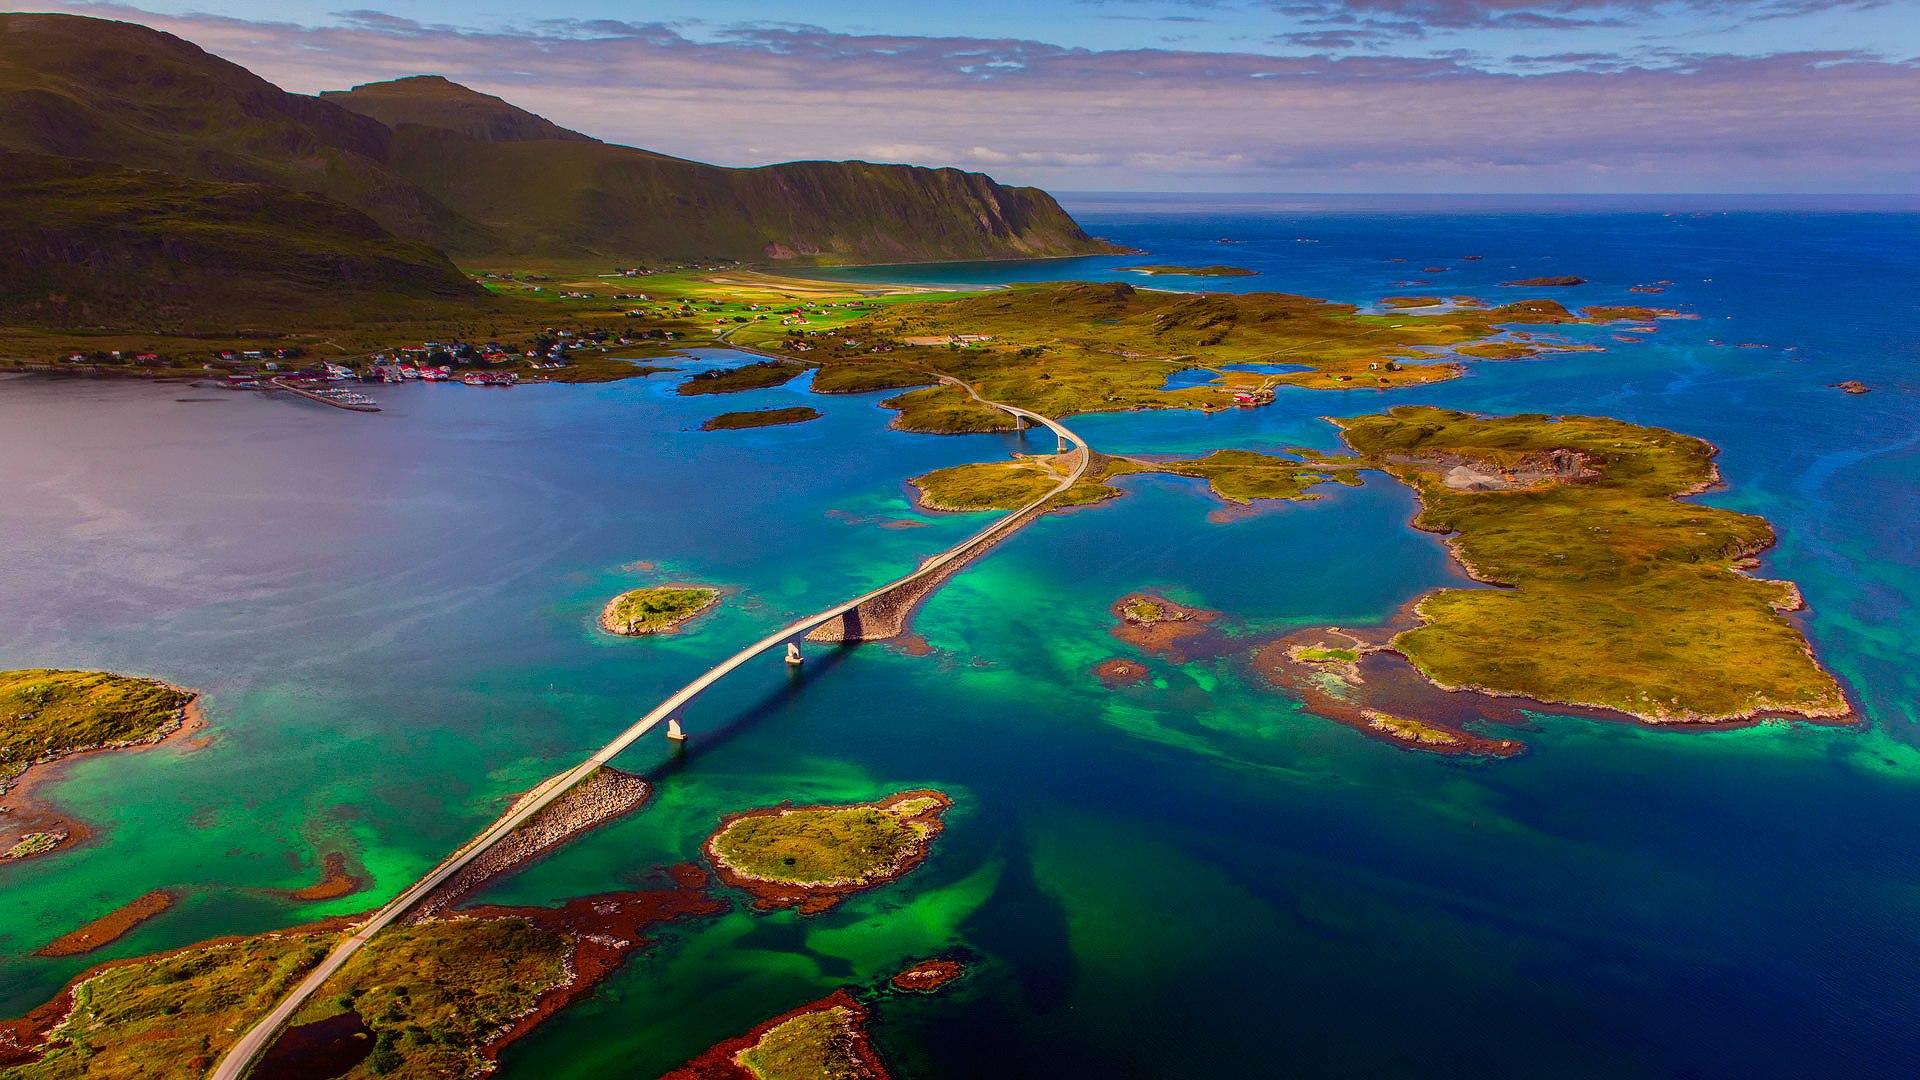 World___Norway_A_bridge_in_the_Lofoten_Islands__Norway_094847_.jpg